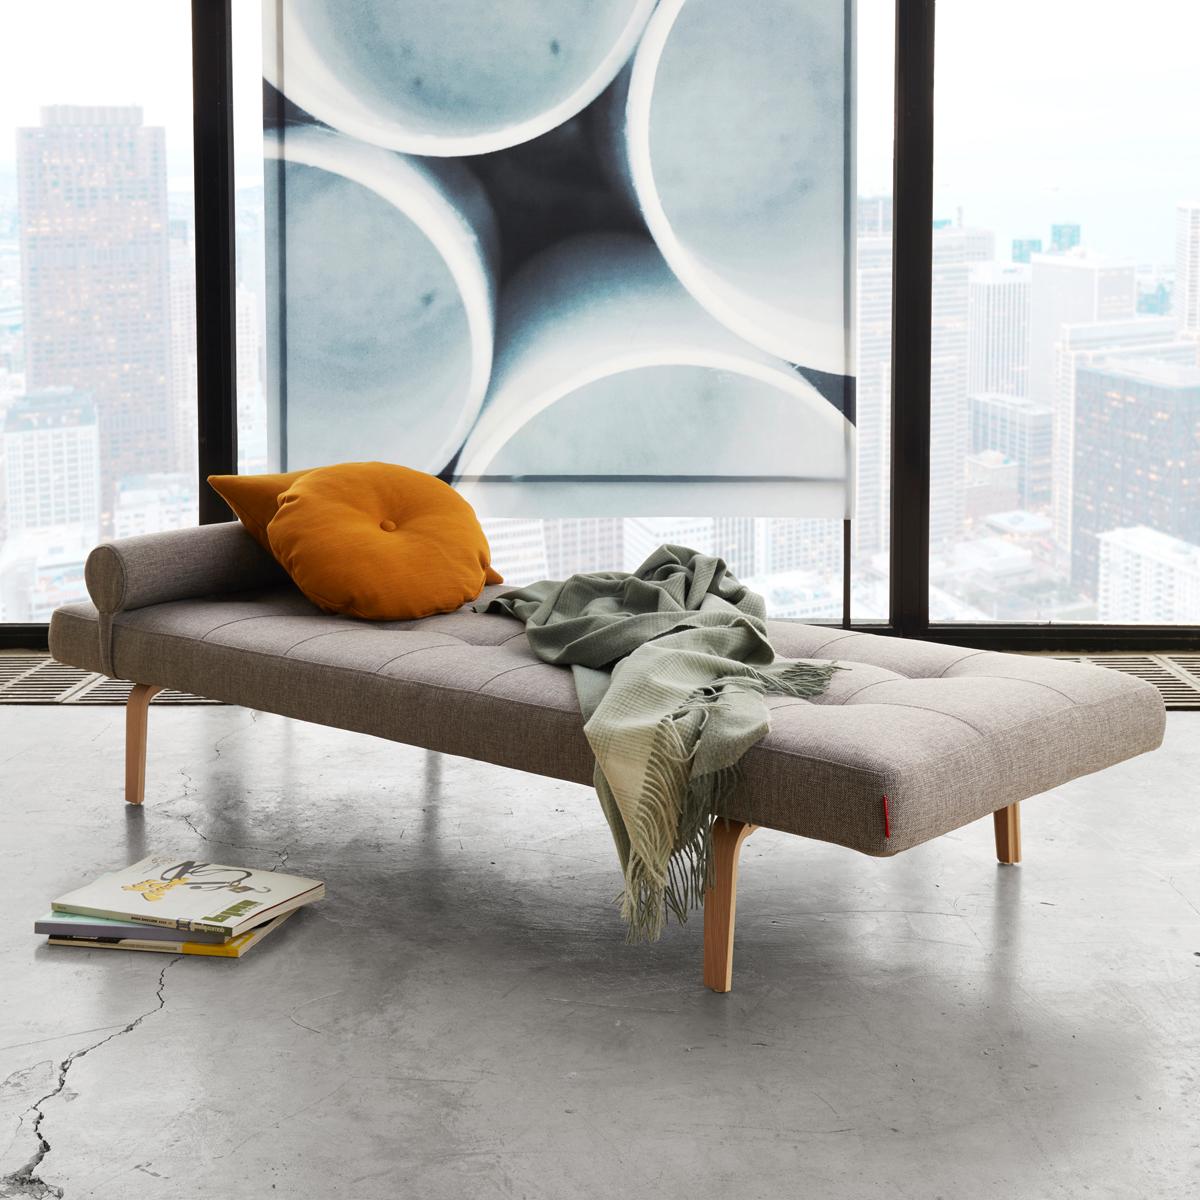 Design daybed